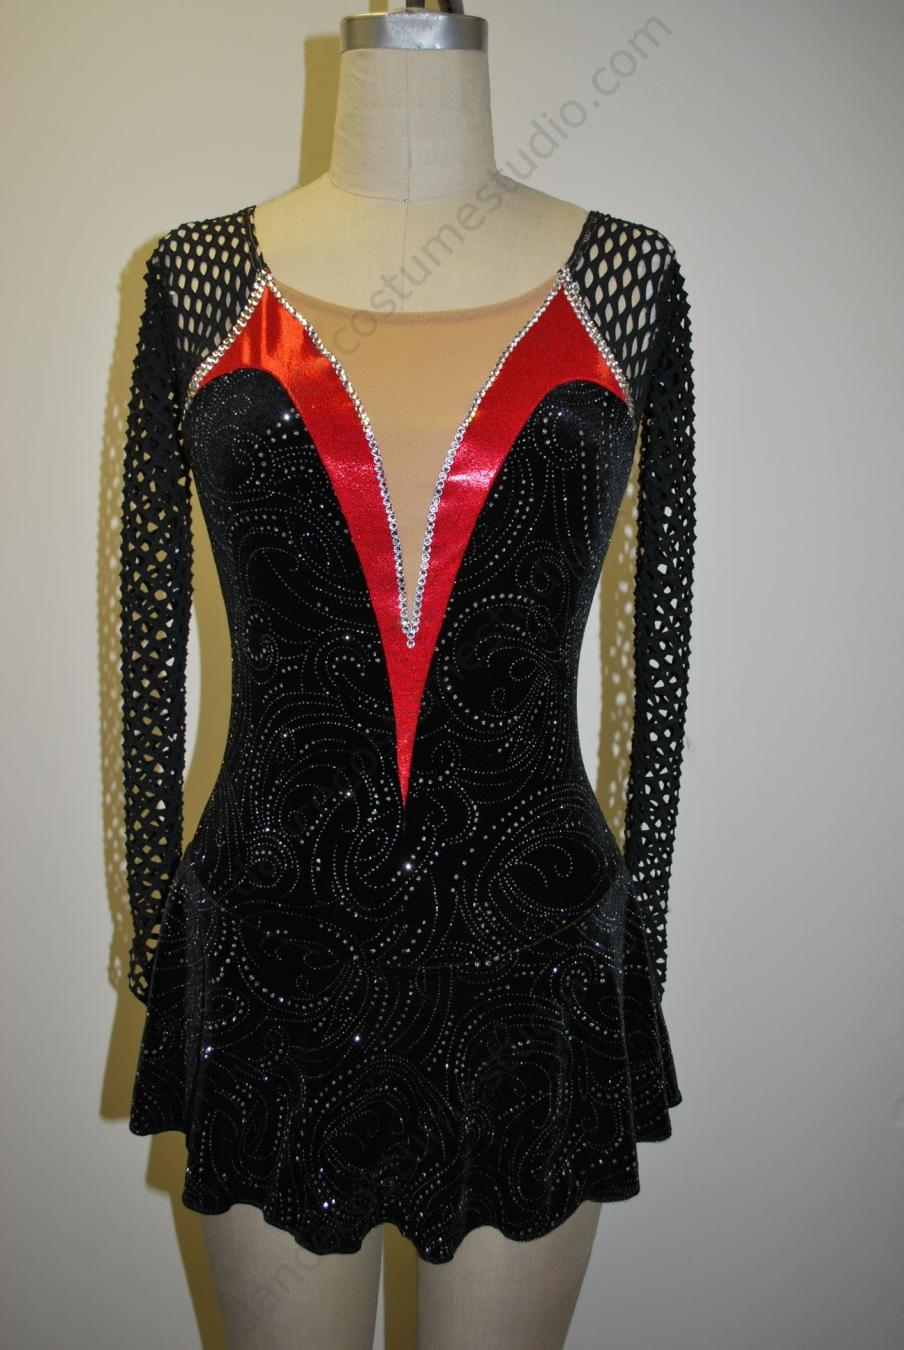 Figure Skating Dresses - Performing Outfit Design Studio